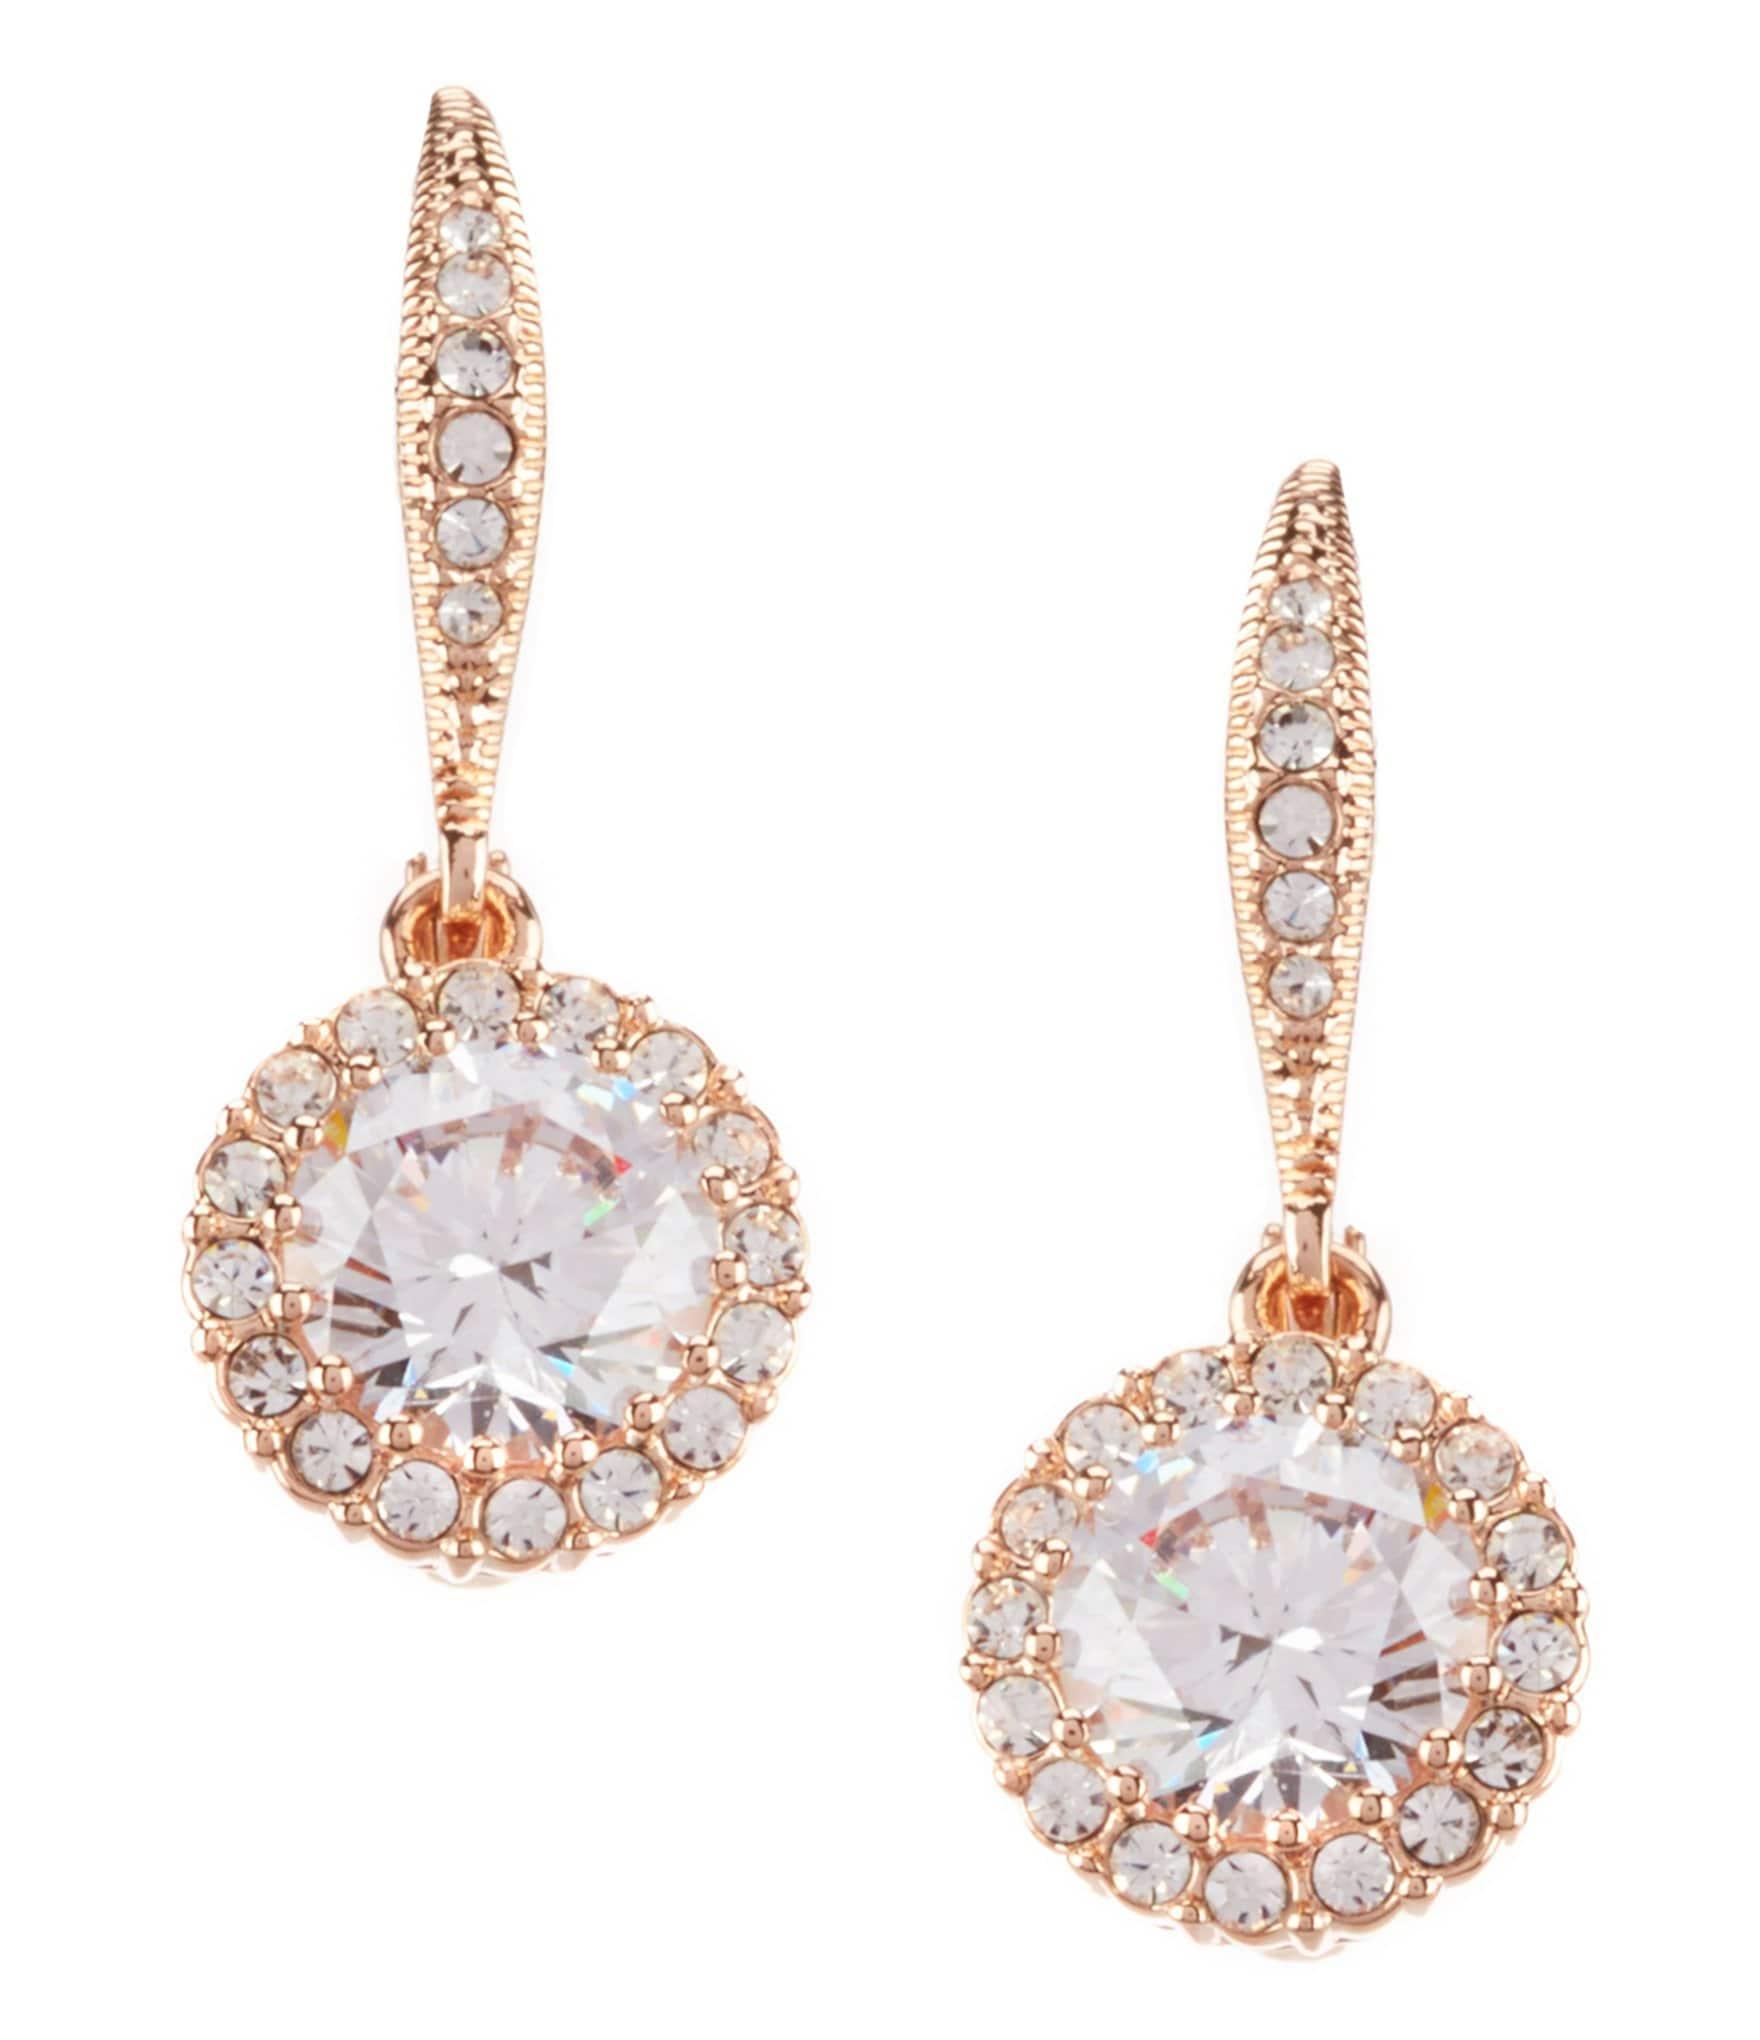 Nadri Accessories Jewelry